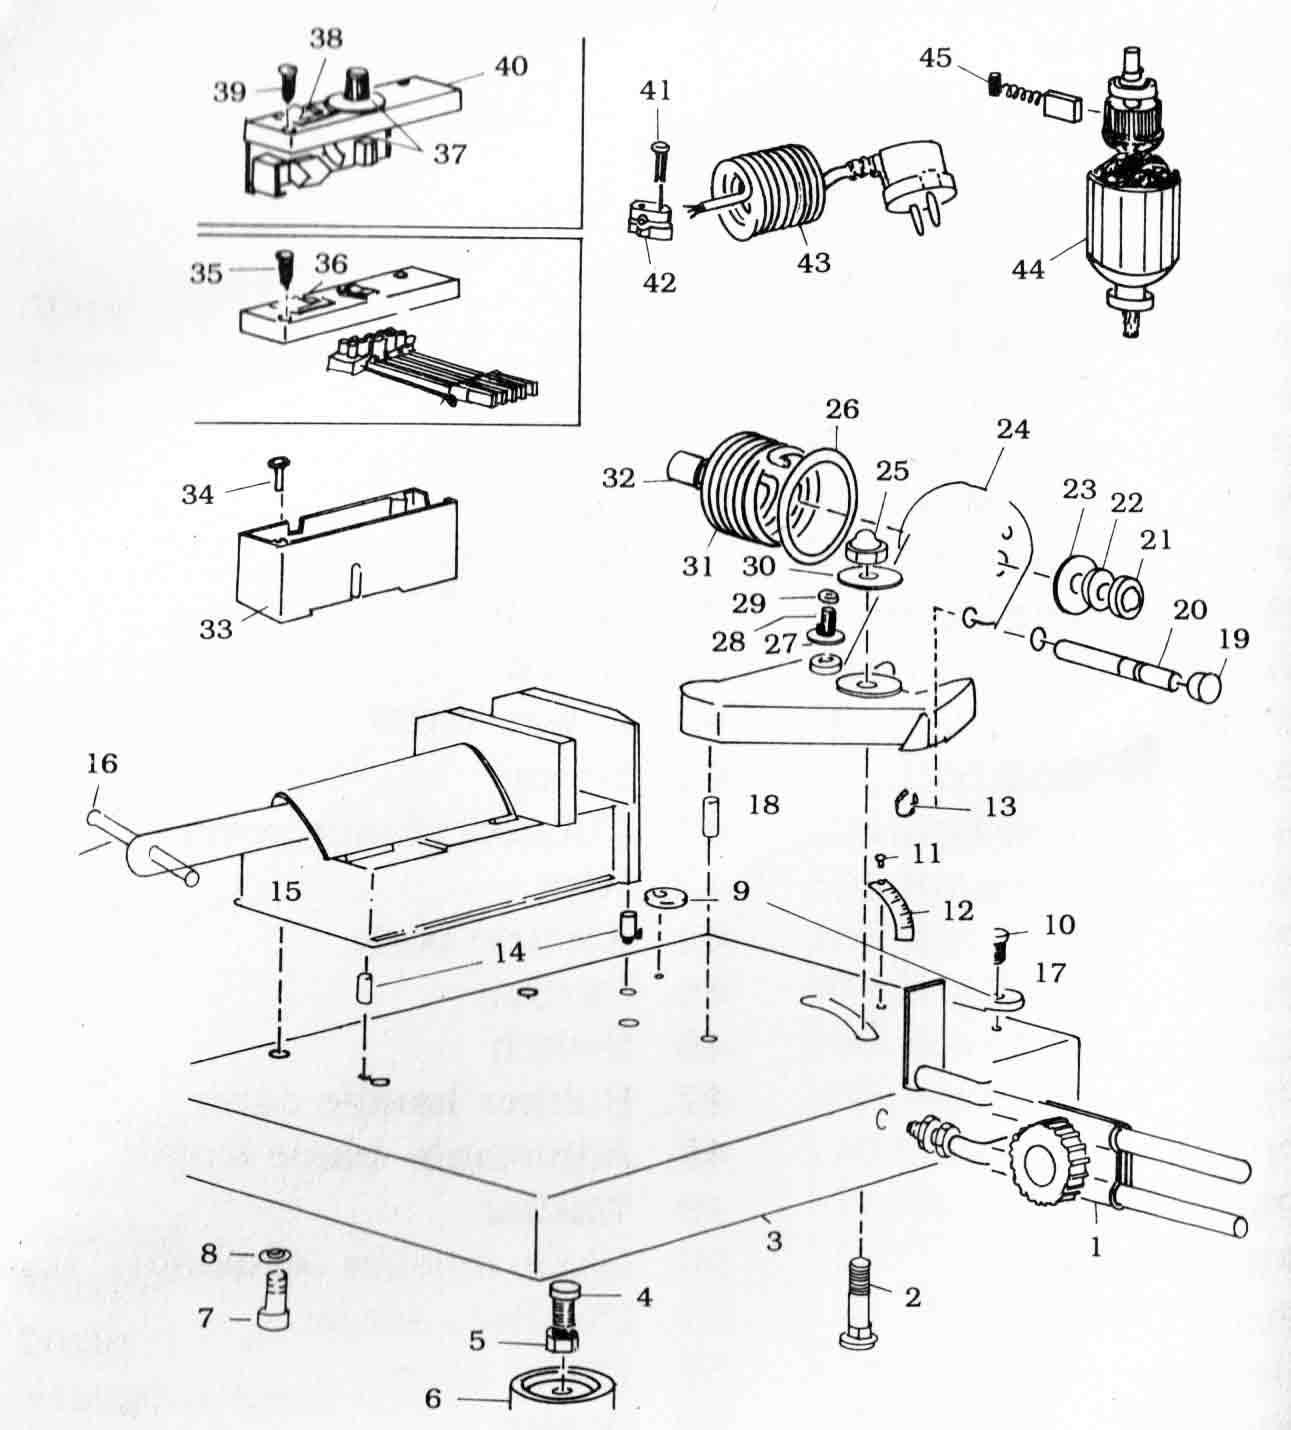 manual typewriter diagram 2004 volkswagen jetta radio wiring